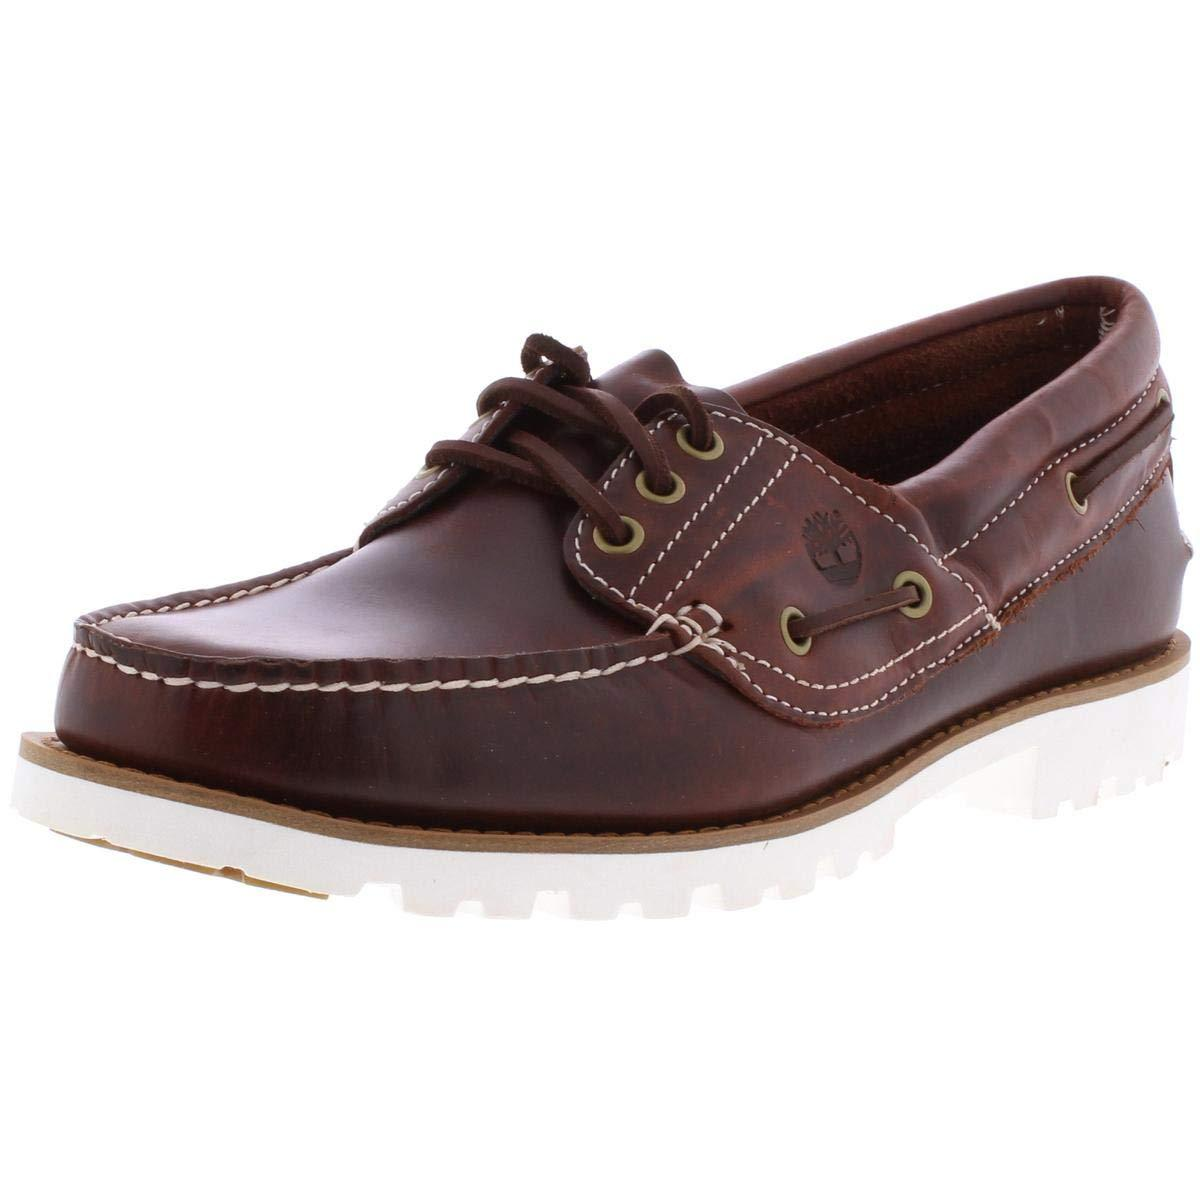 chaussure bateau timberland femme